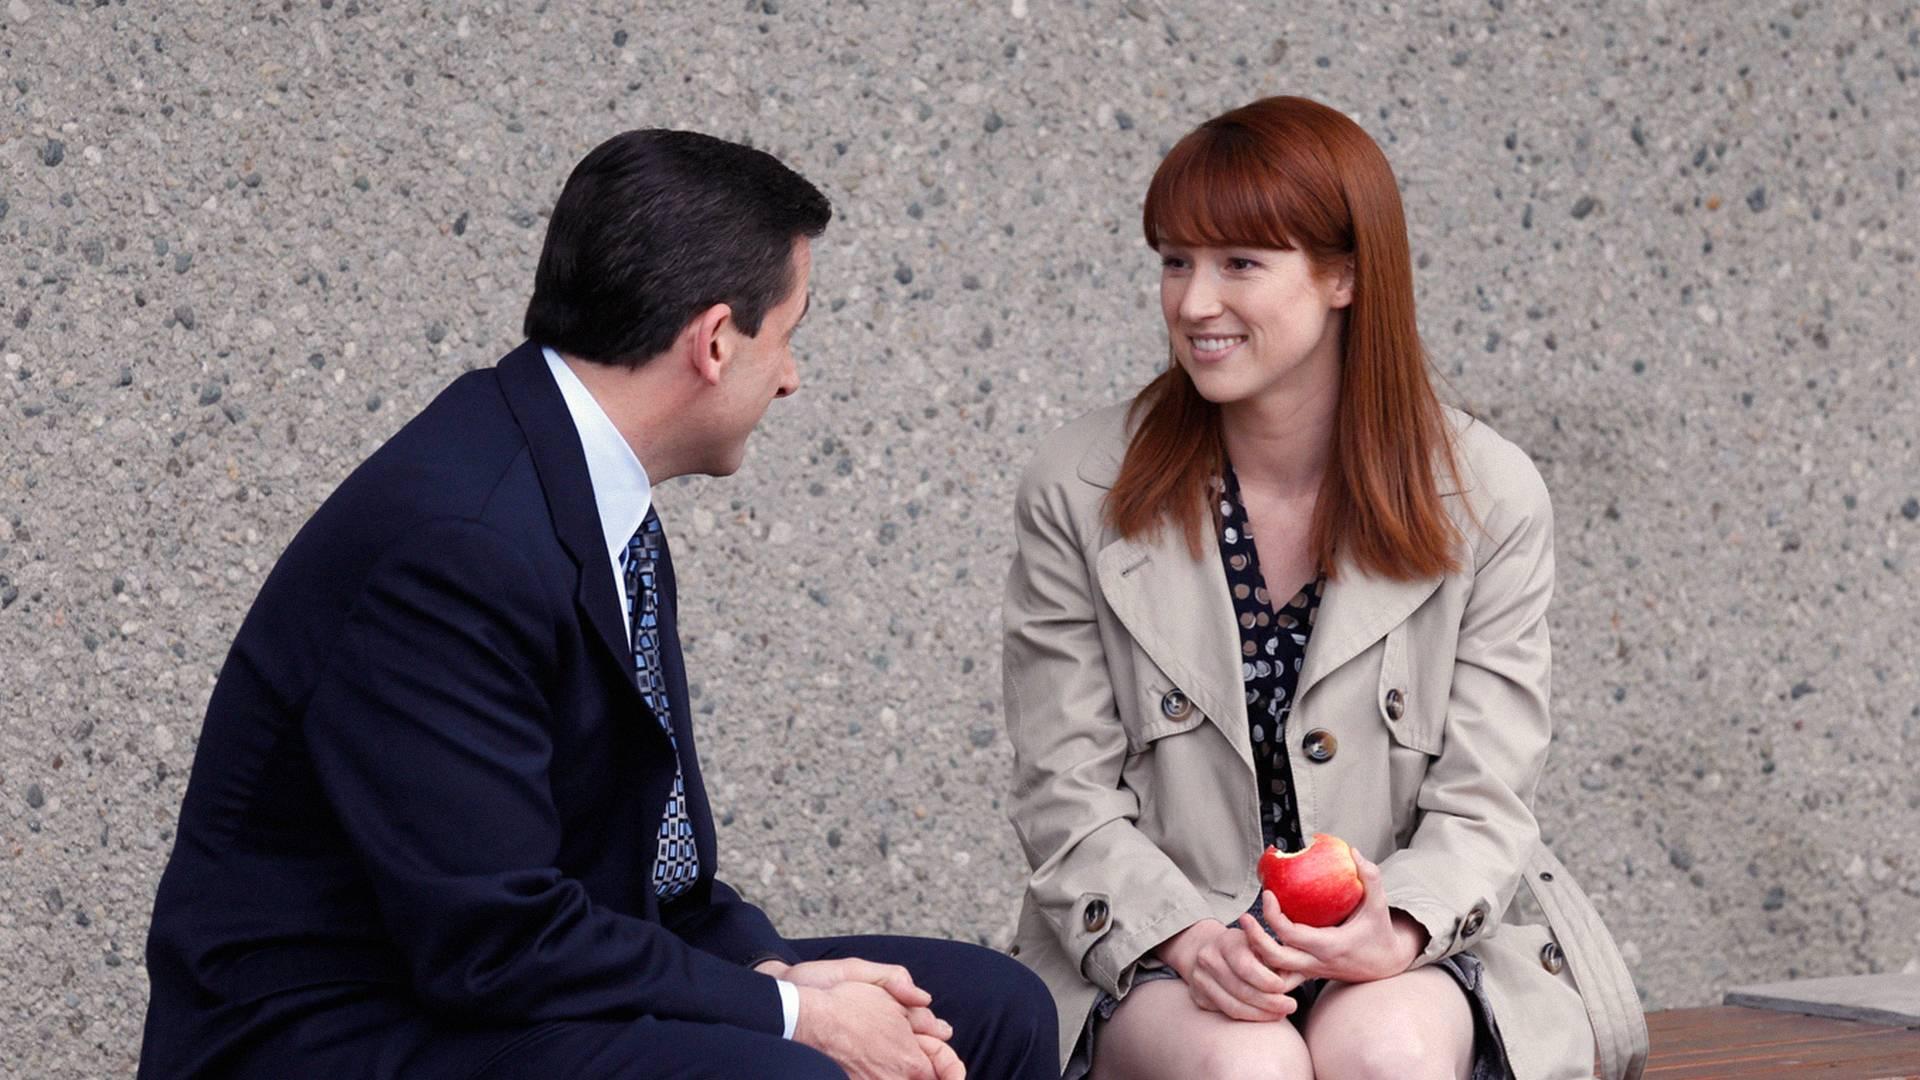 The Office Season 7 Episode 23